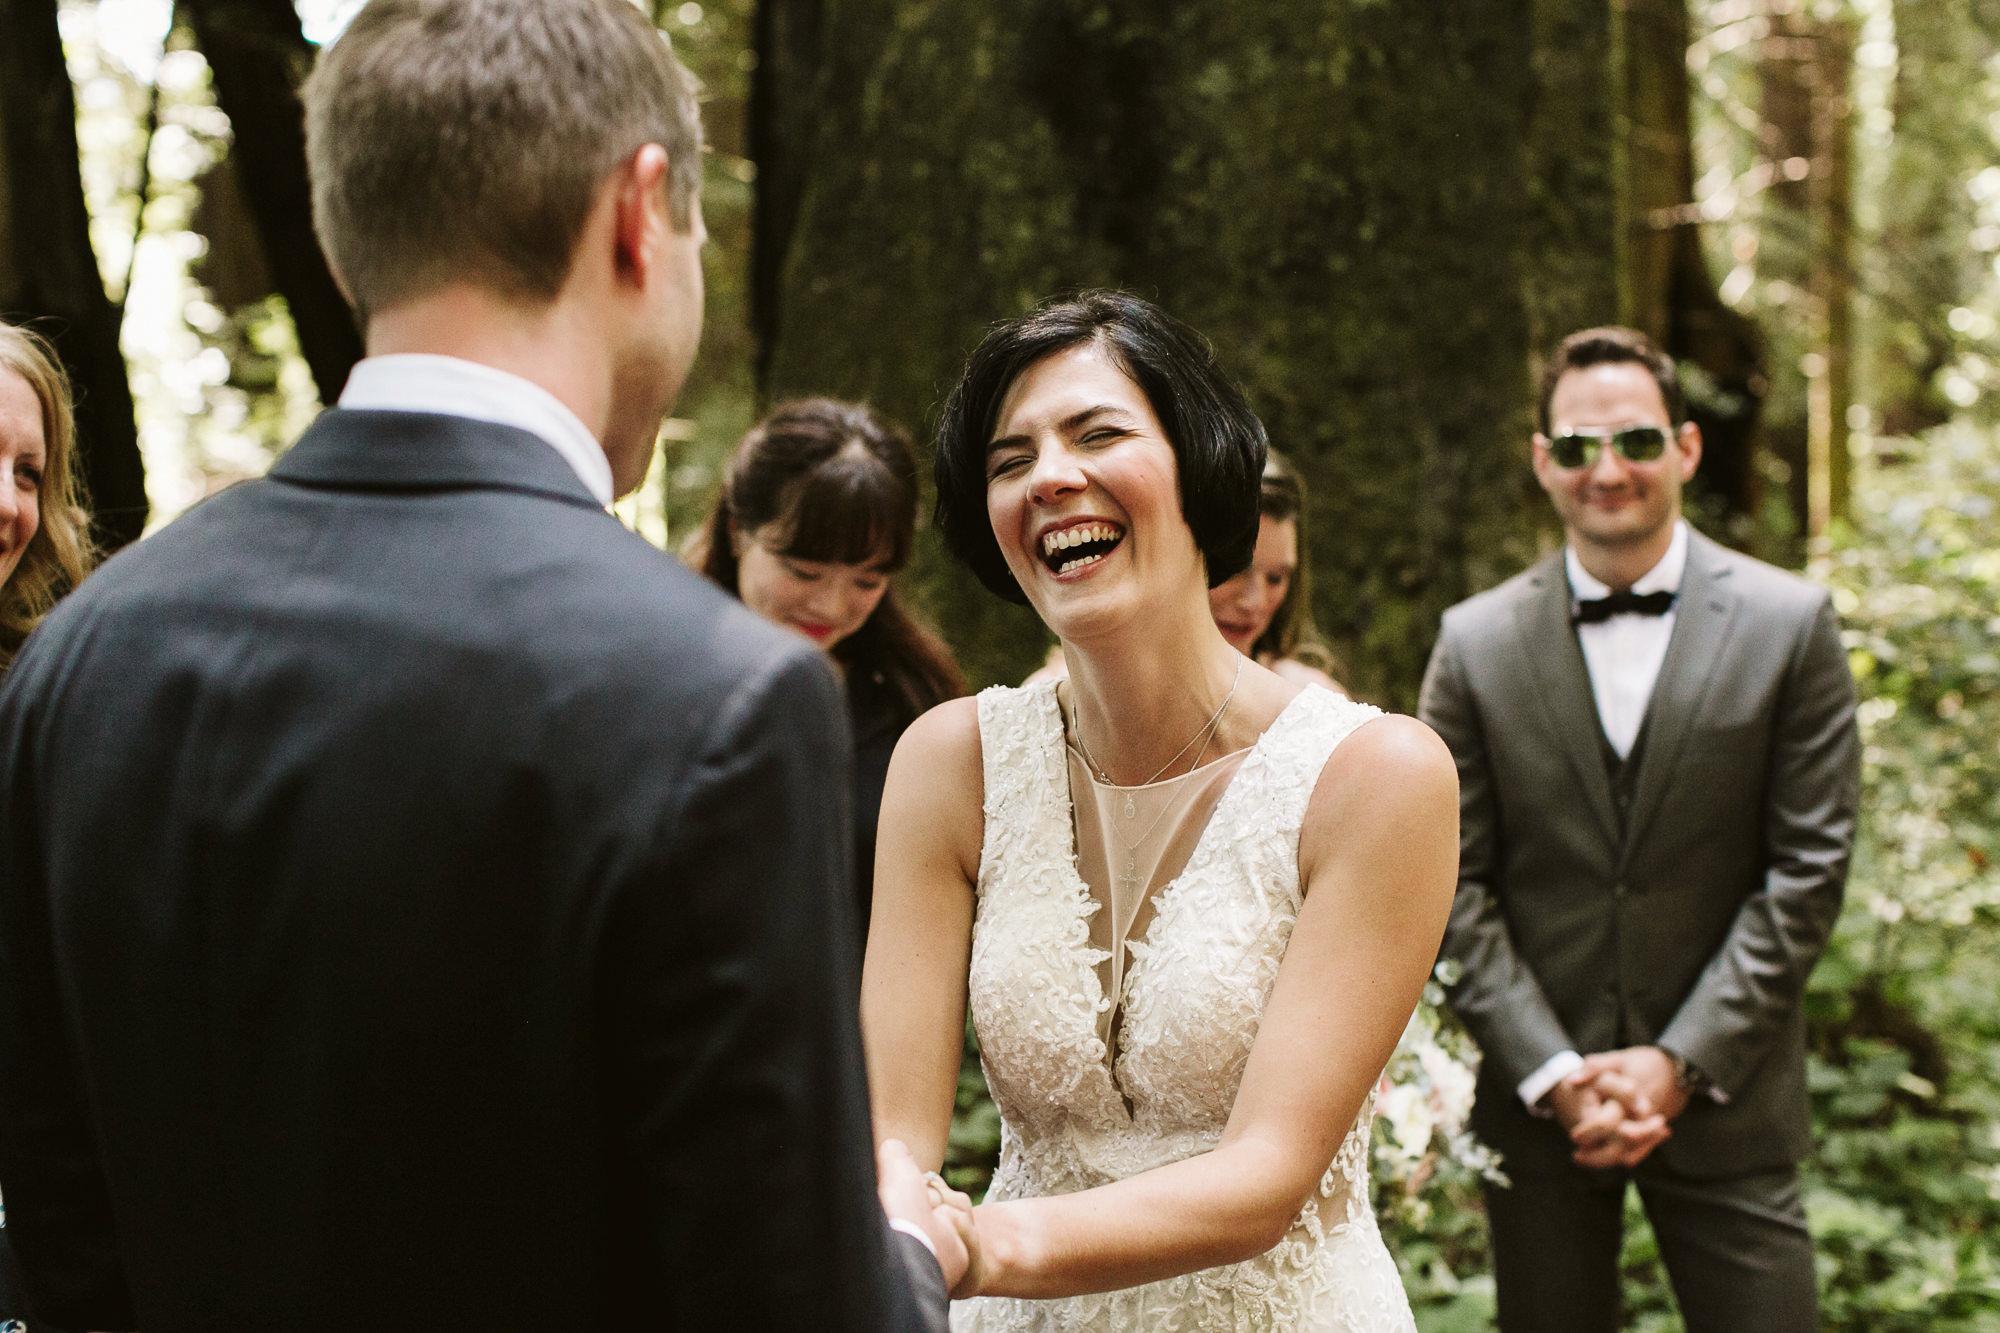 California-wedding-photographer-alfonso-flores-pamplin-groove-201.jpg